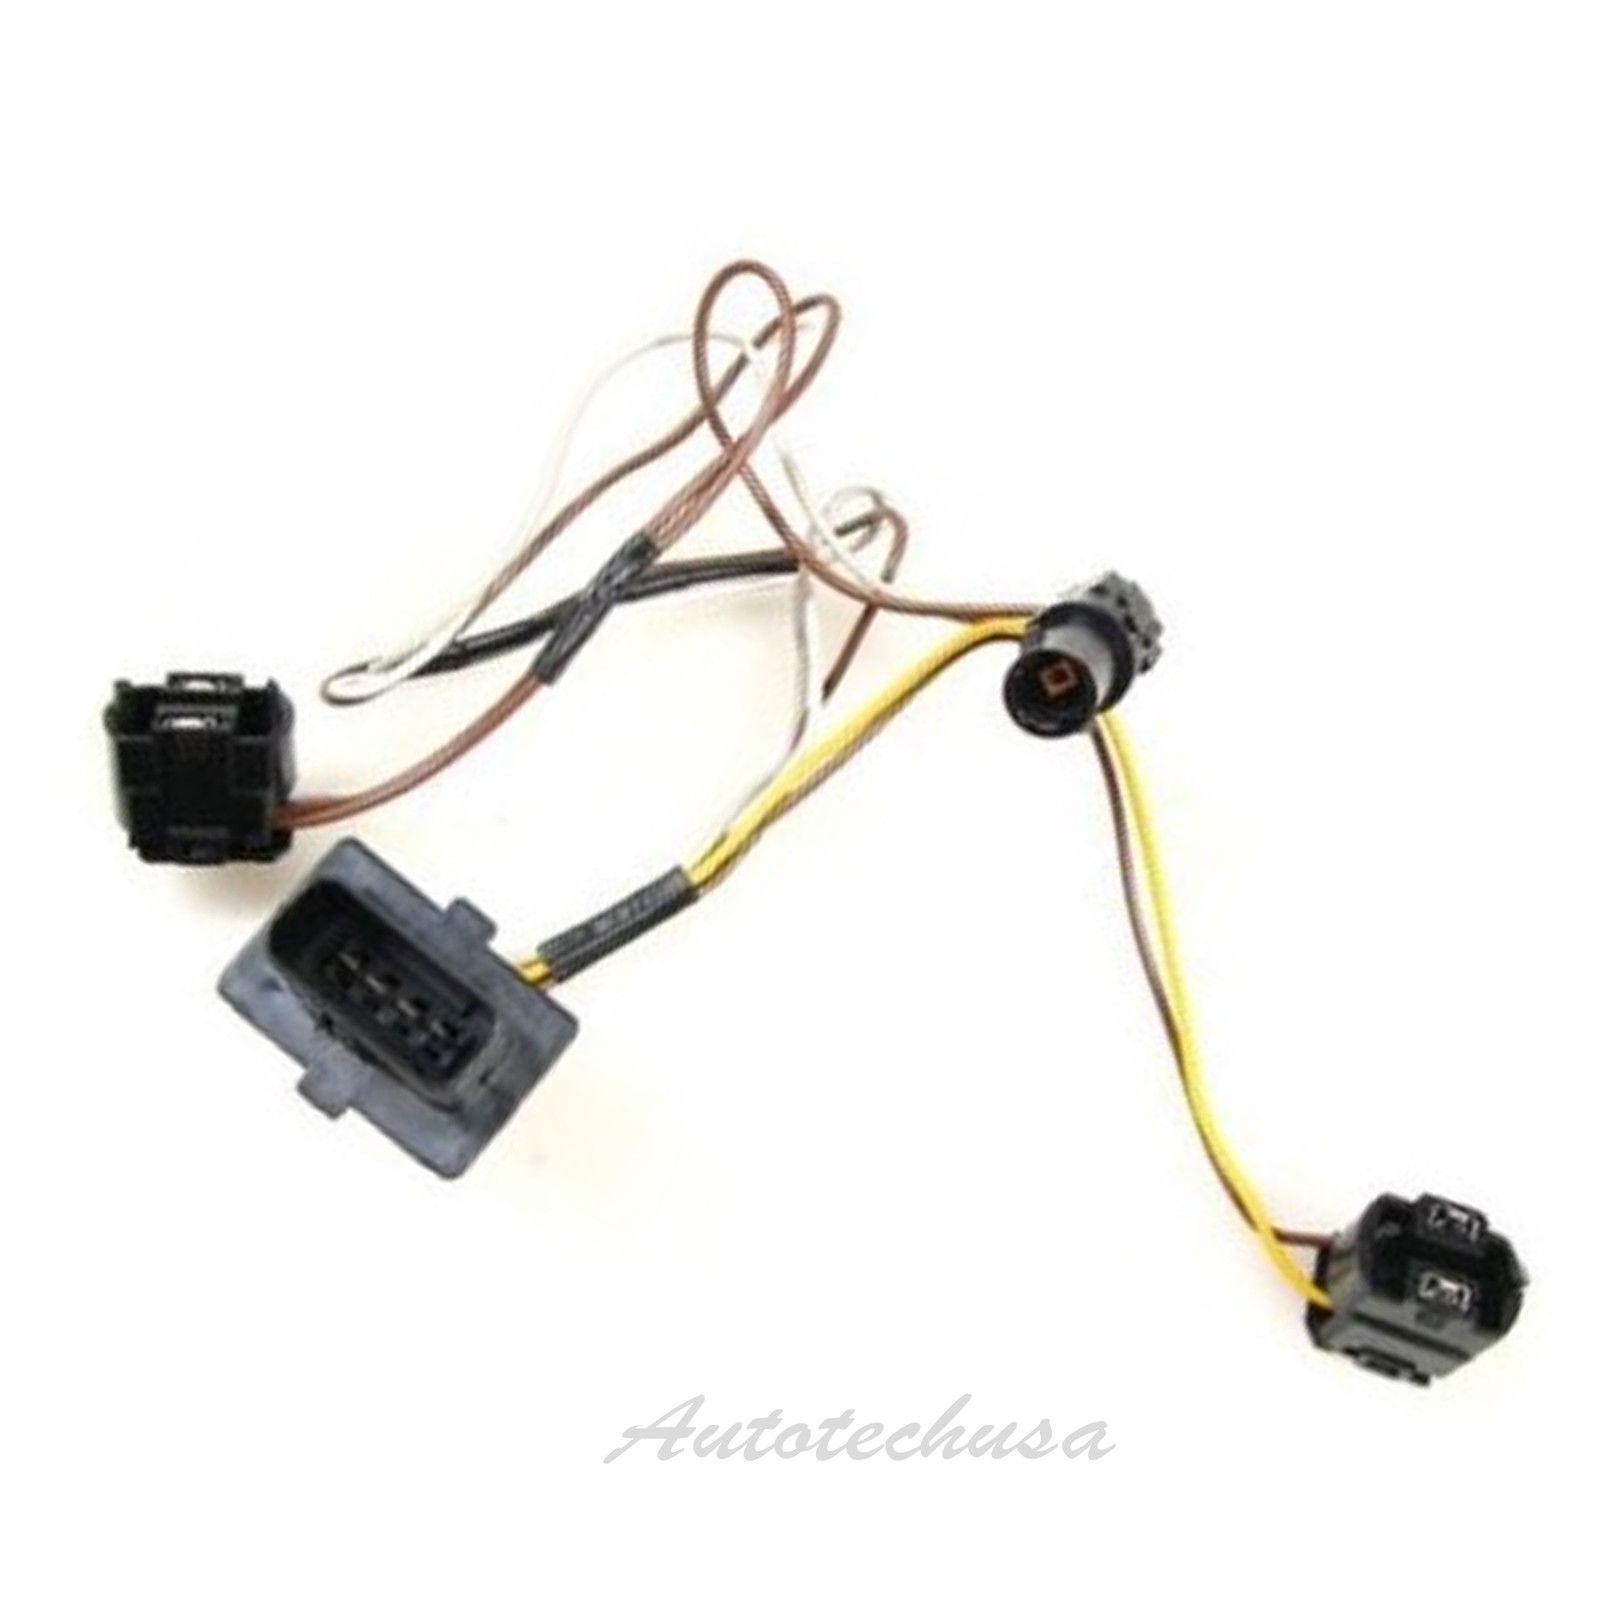 B360LS For Mercedes E300 E320 E420 Headlight Wire Harness Light Socket Connector